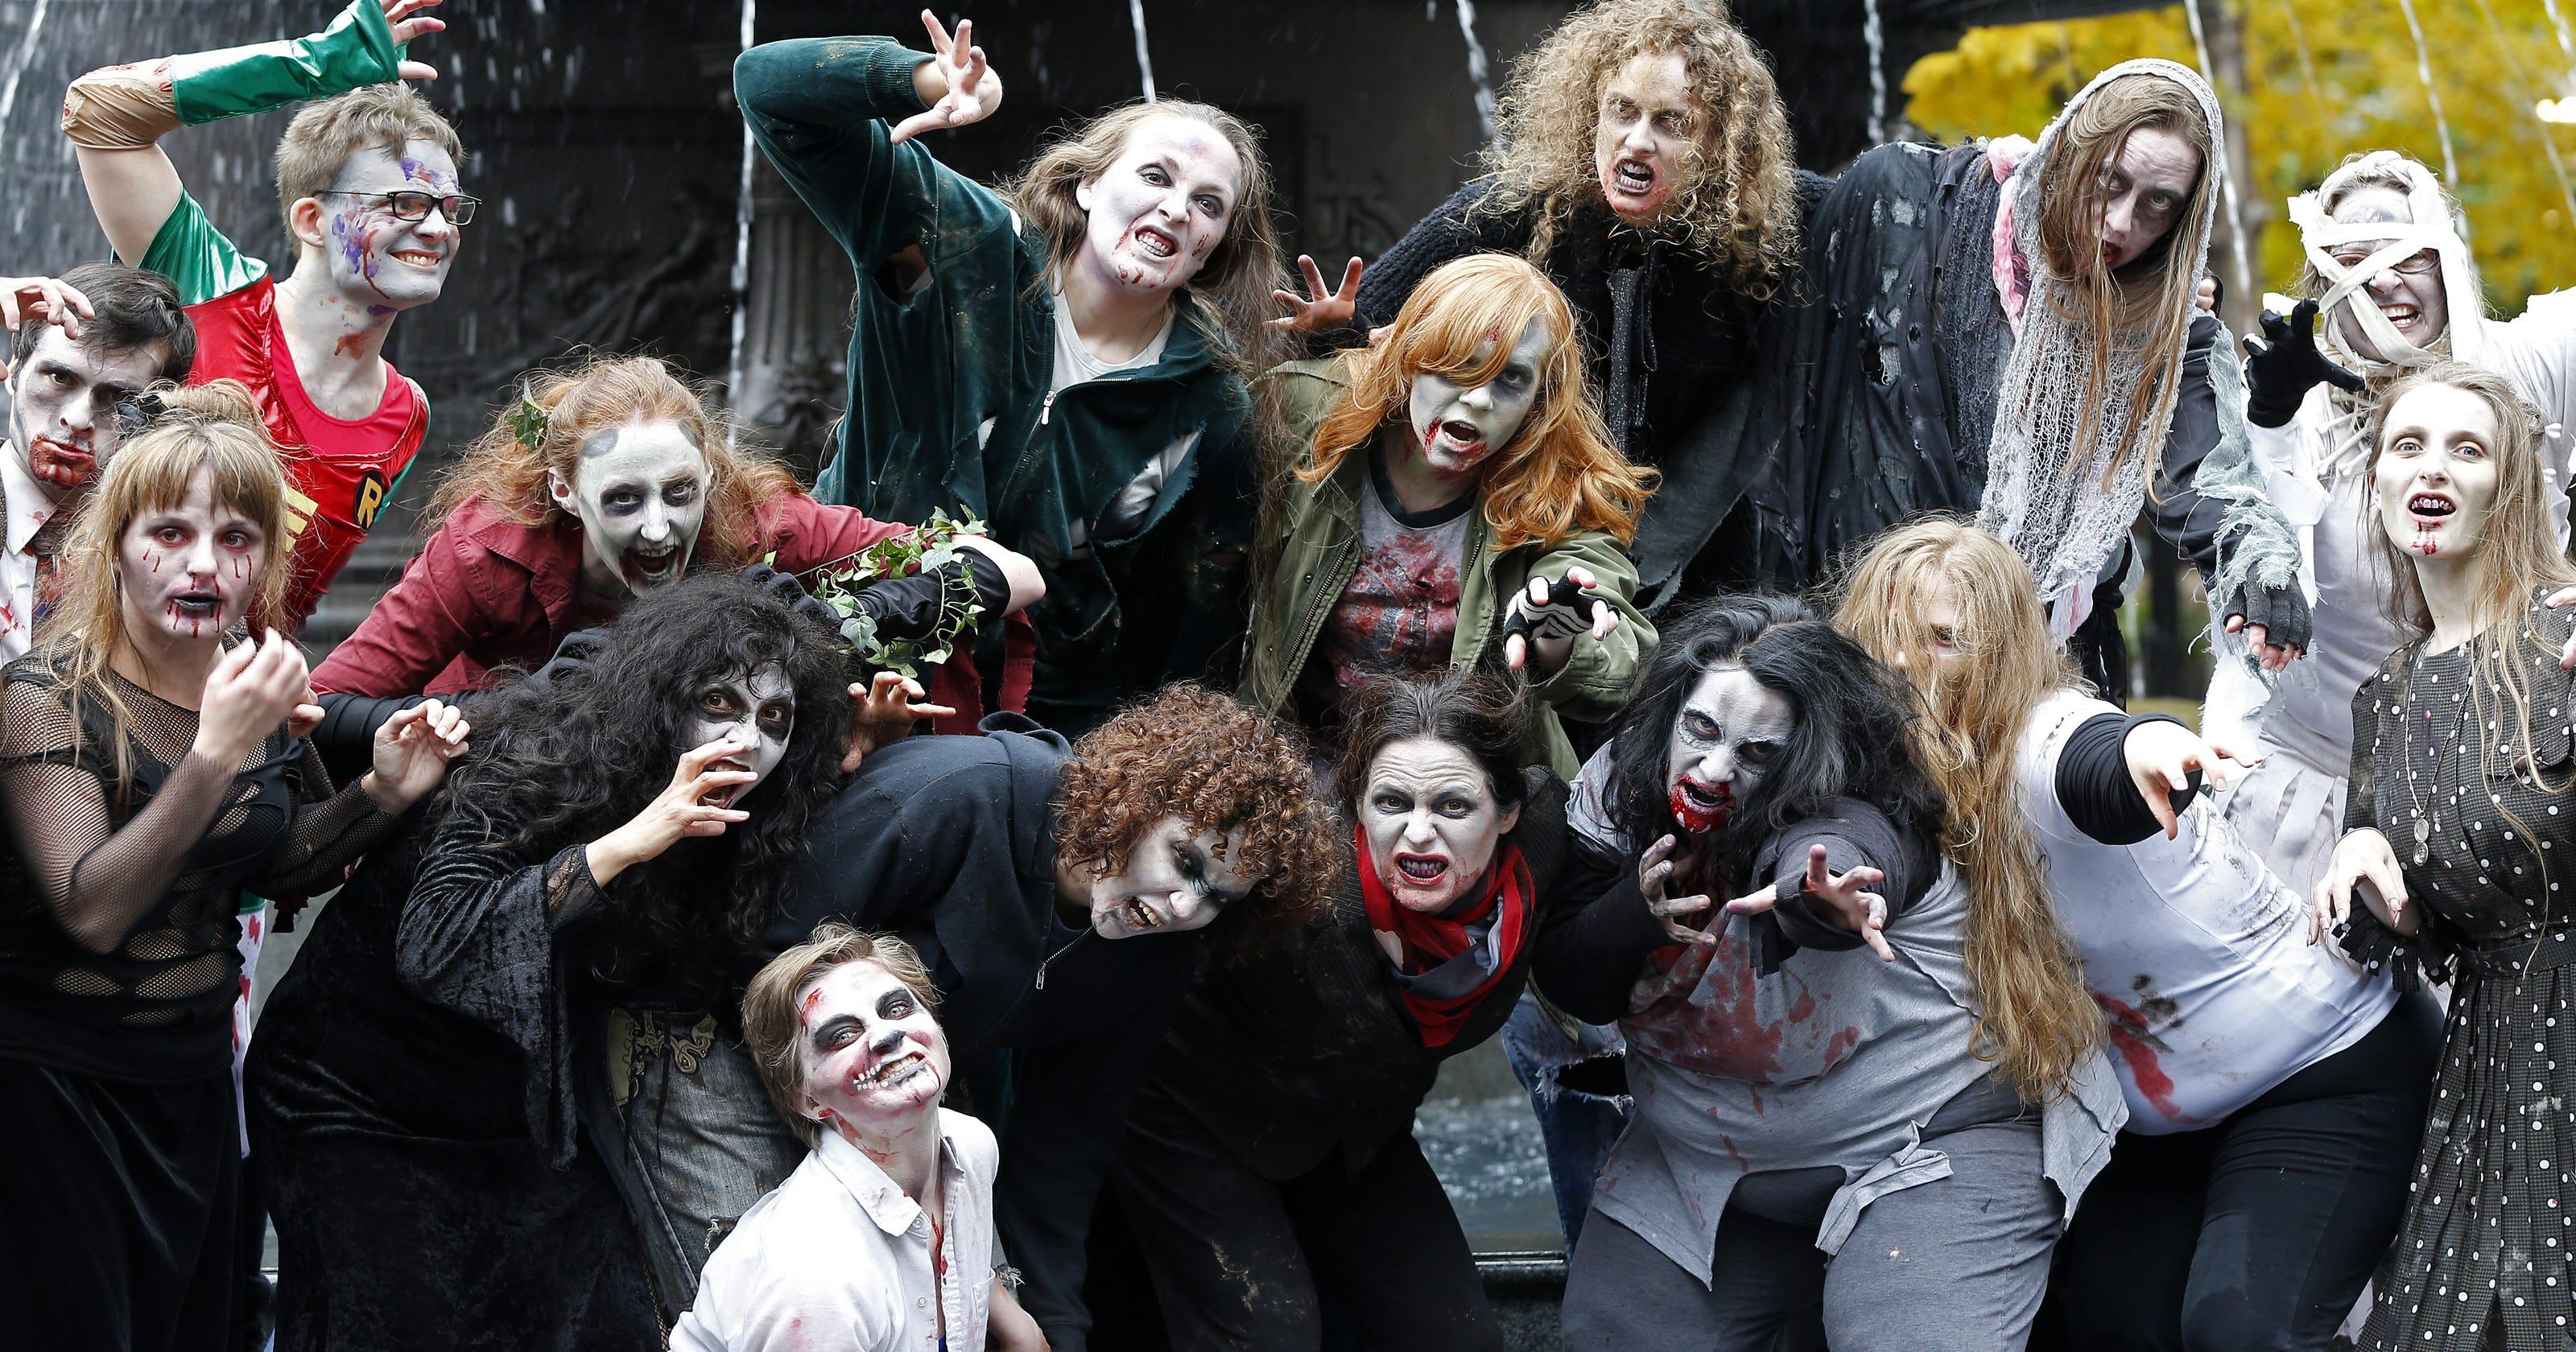 Halloween events this weekend in Cincinnati and Northern Kentucky ...